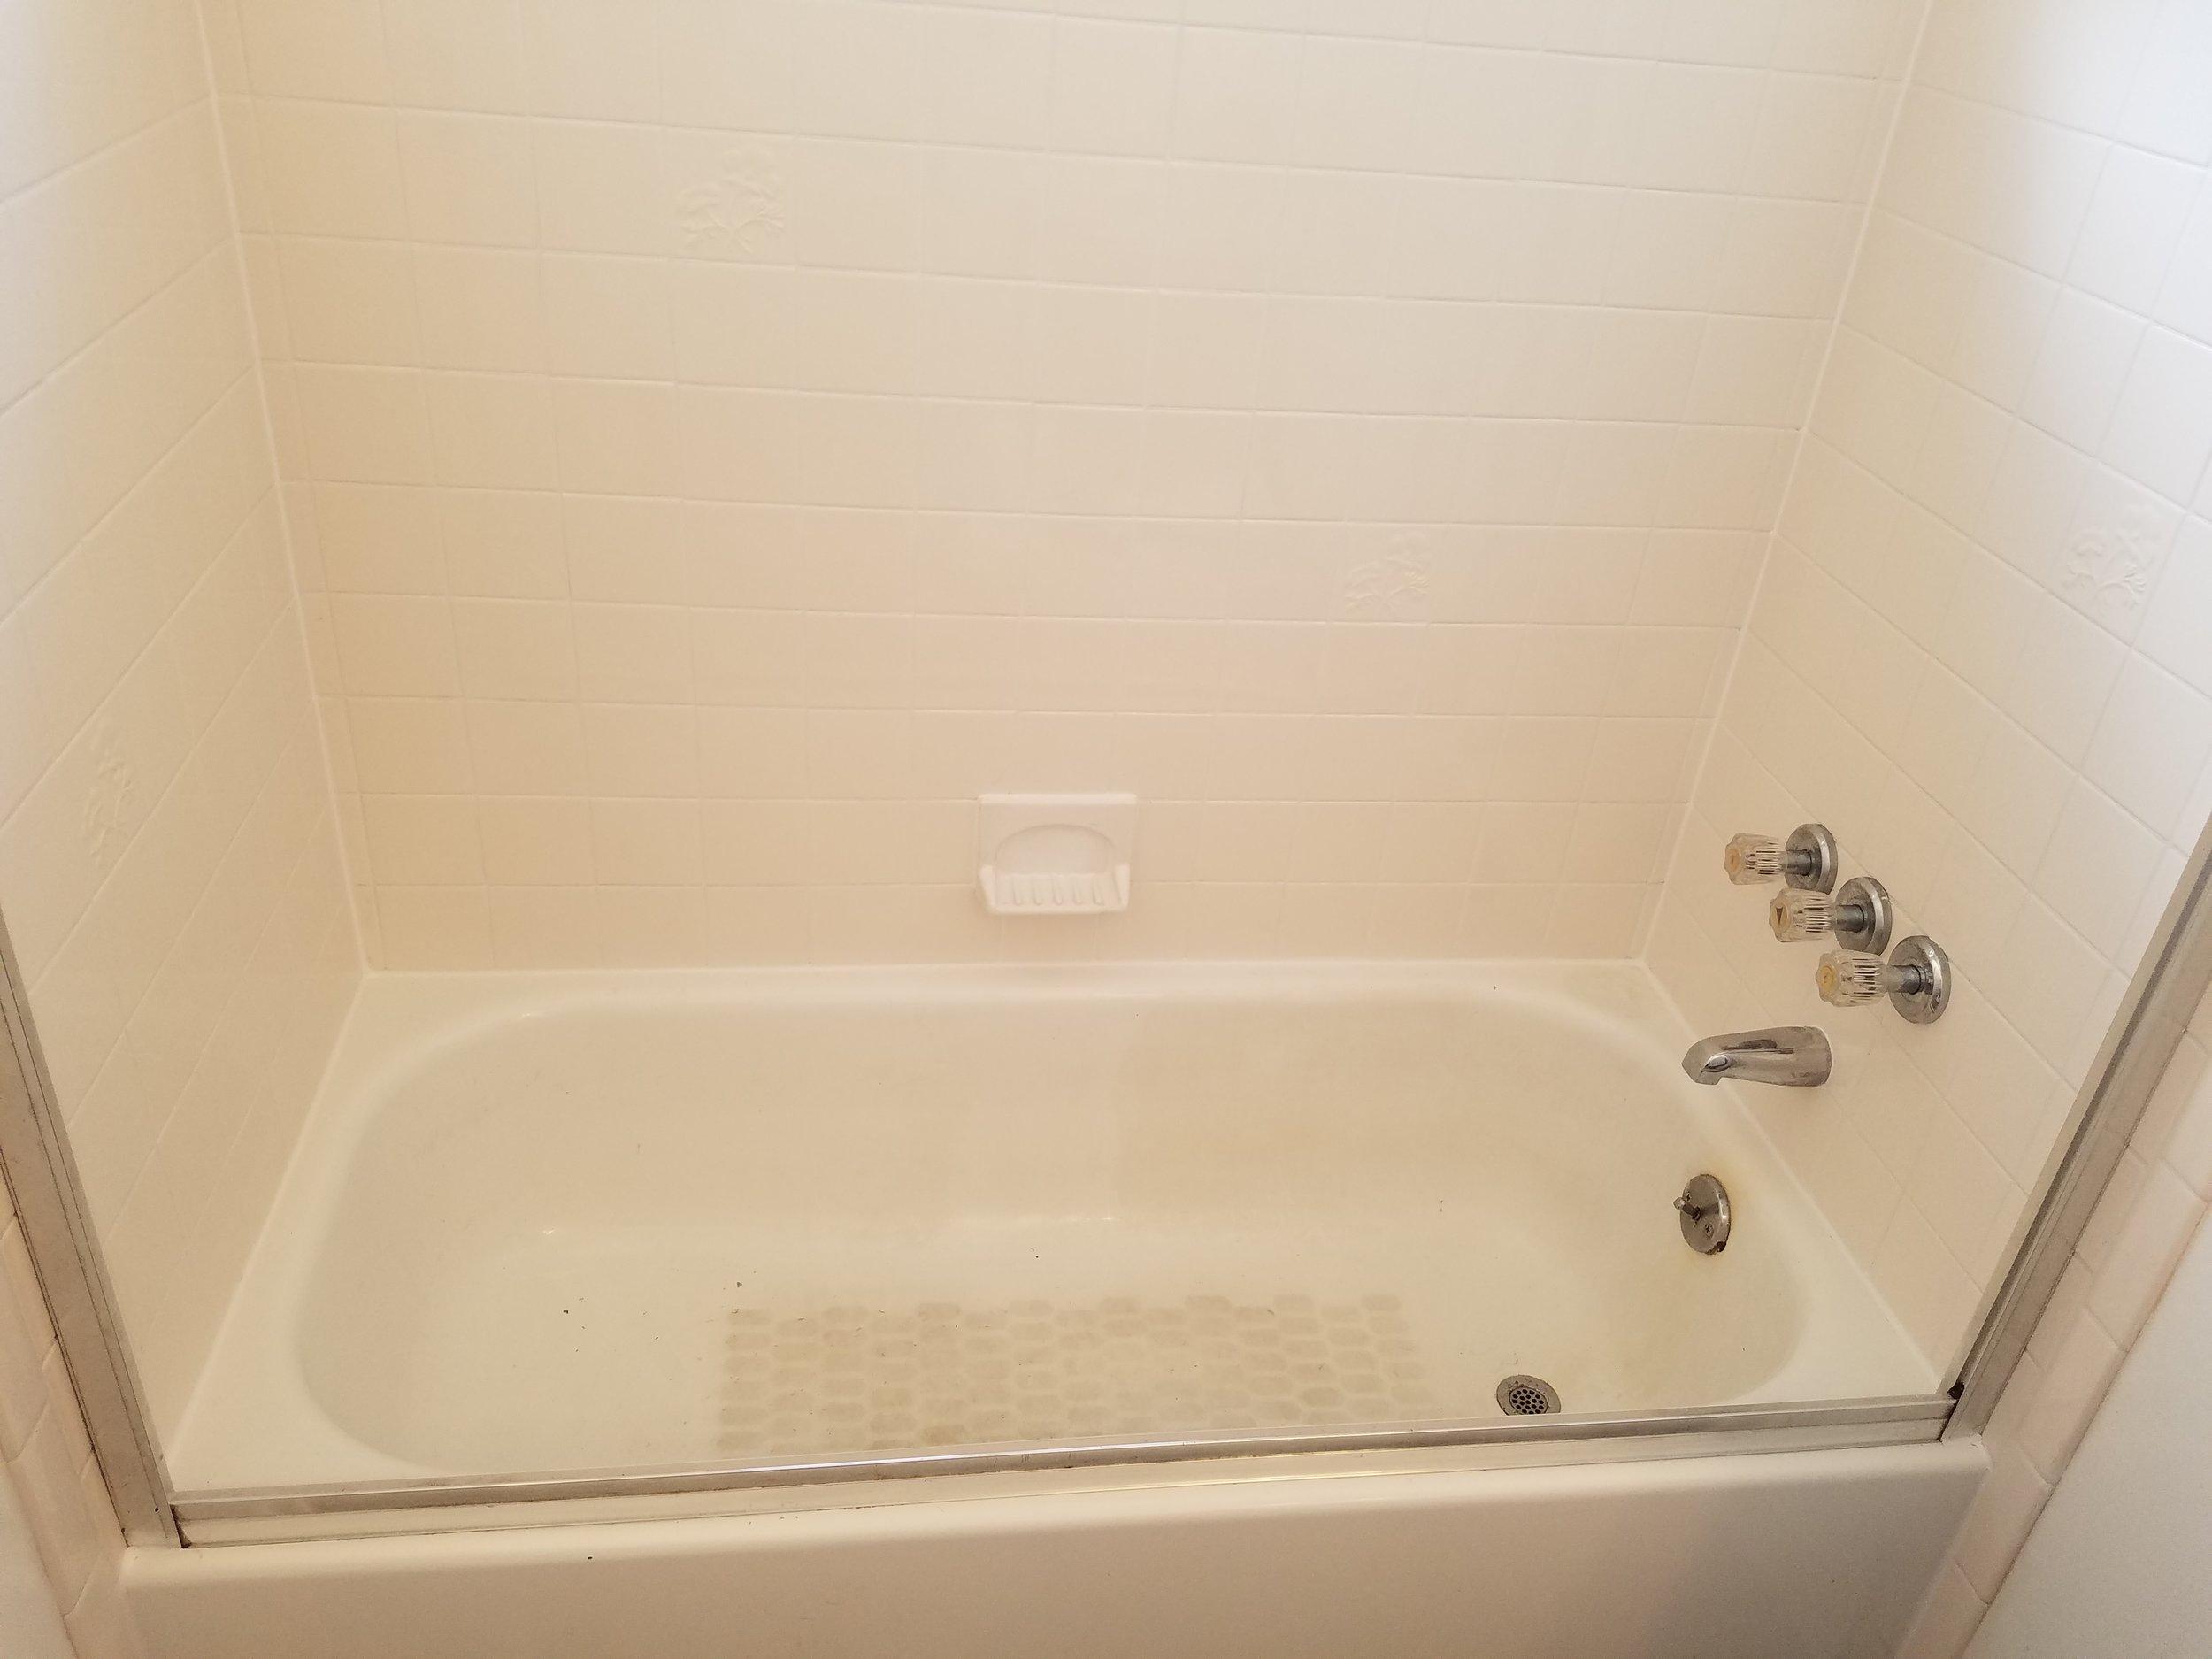 tile cleaning shower tub repair bathtub restoration caulking sealing grout works